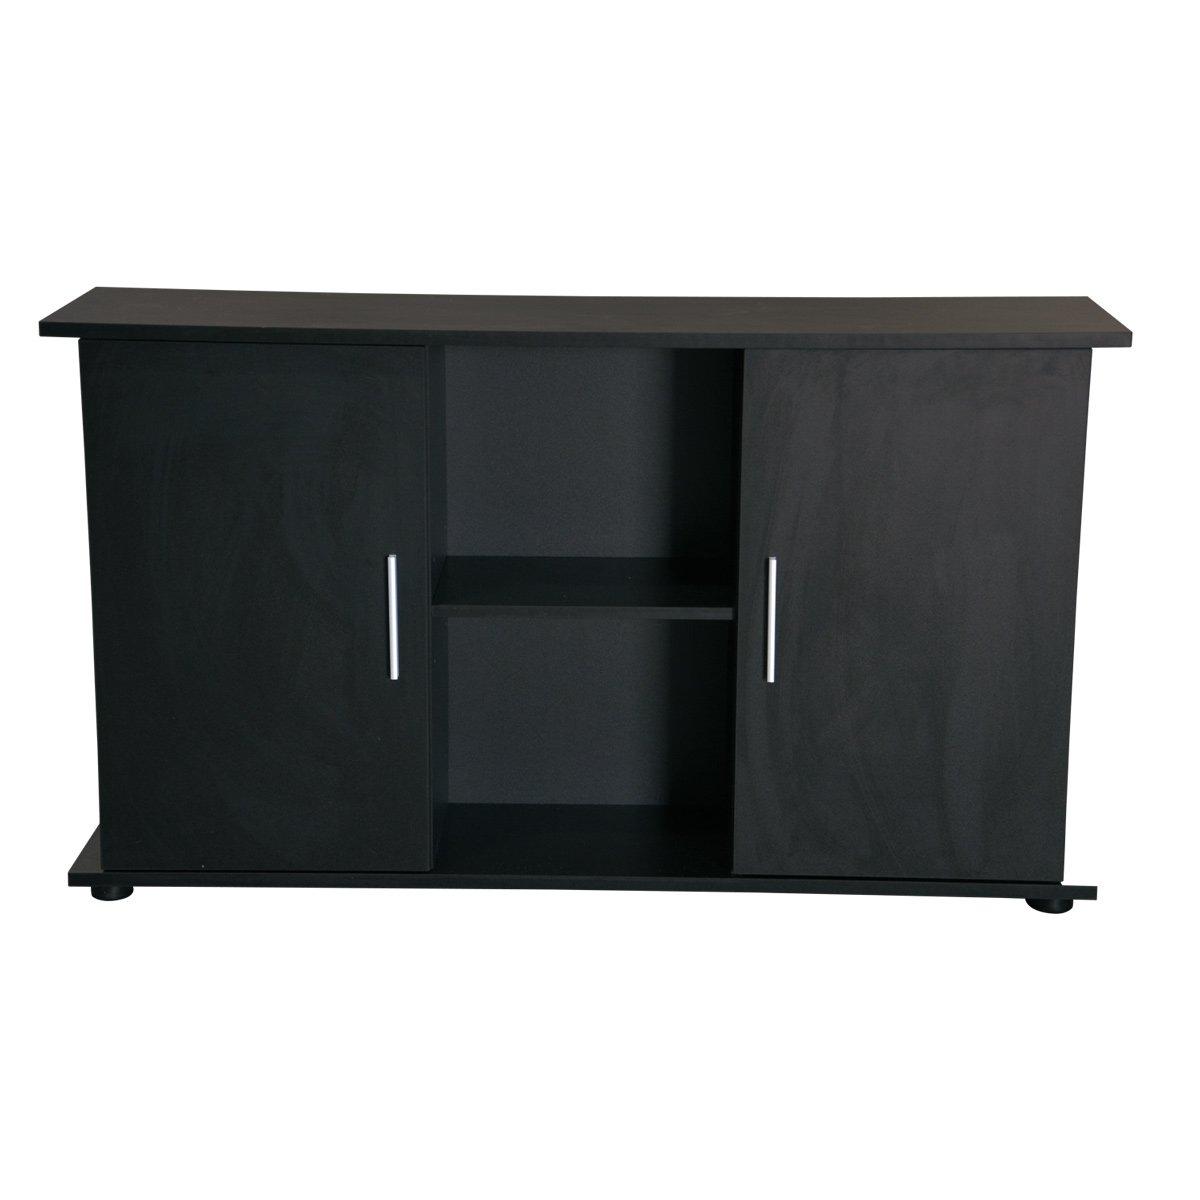 "Seapora 52018 Empress Cabinet Stand, 48"" x"